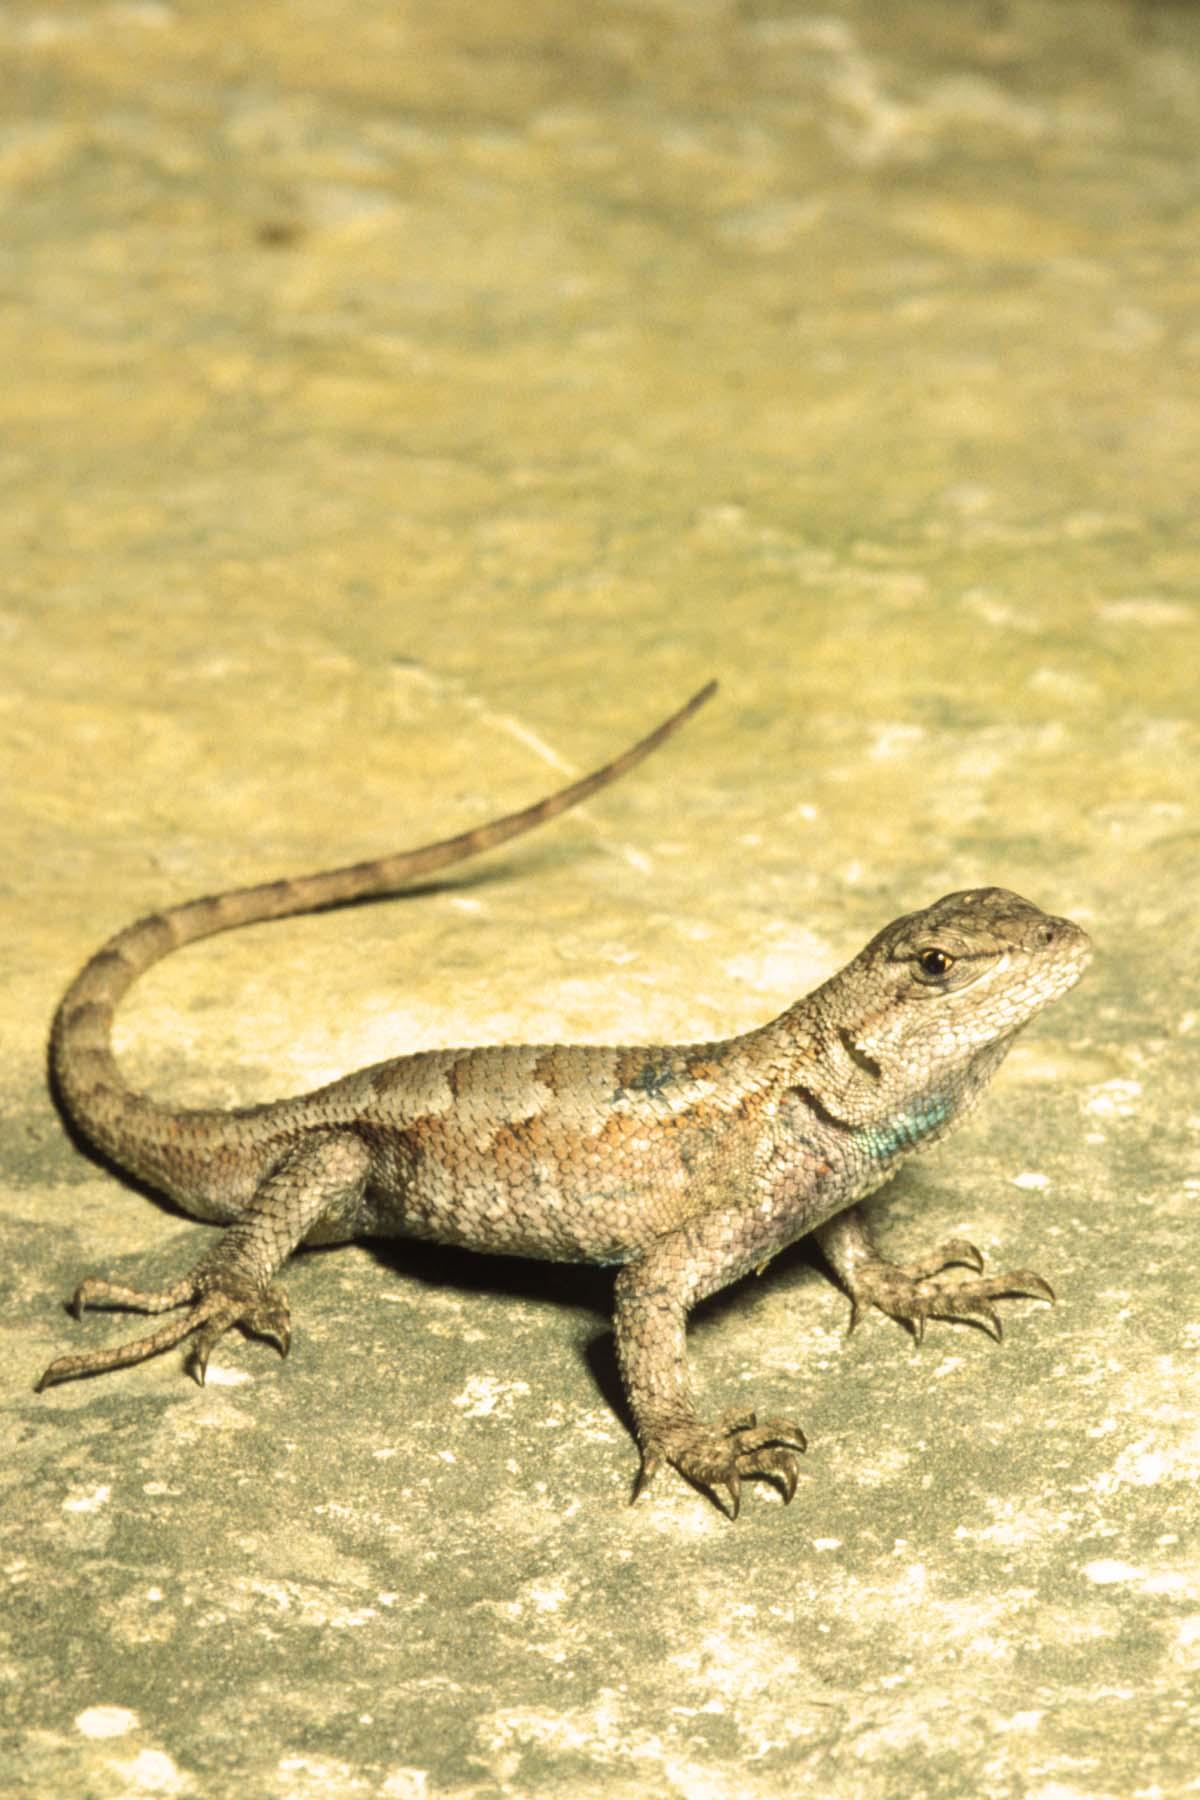 Prairie Lizard Northern Fence Lizard | MDC Discover Nature